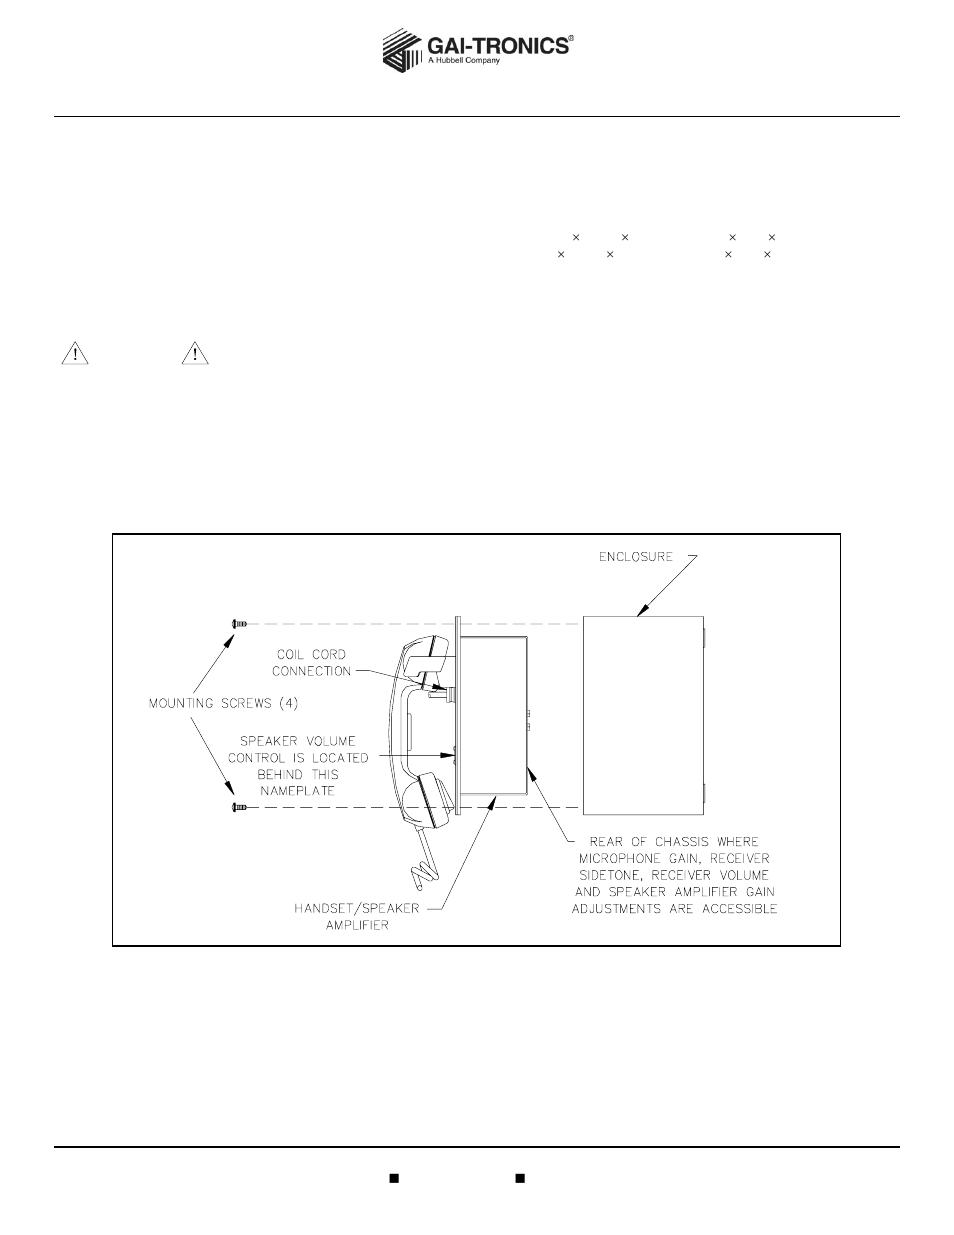 GAI-Tronics 701-302 Page/Party Handset/Speaker Amplifier (115 V AC